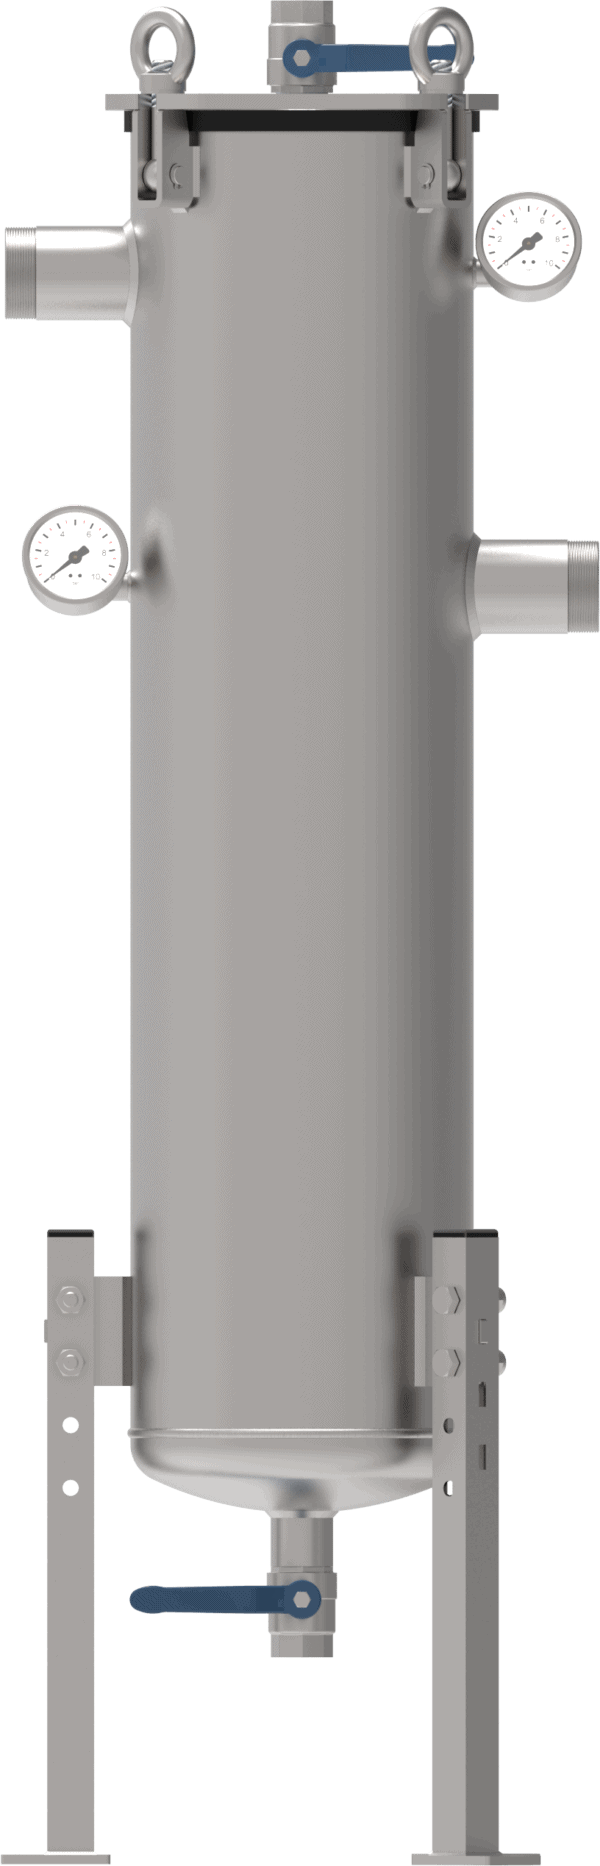 zakken filterhuis